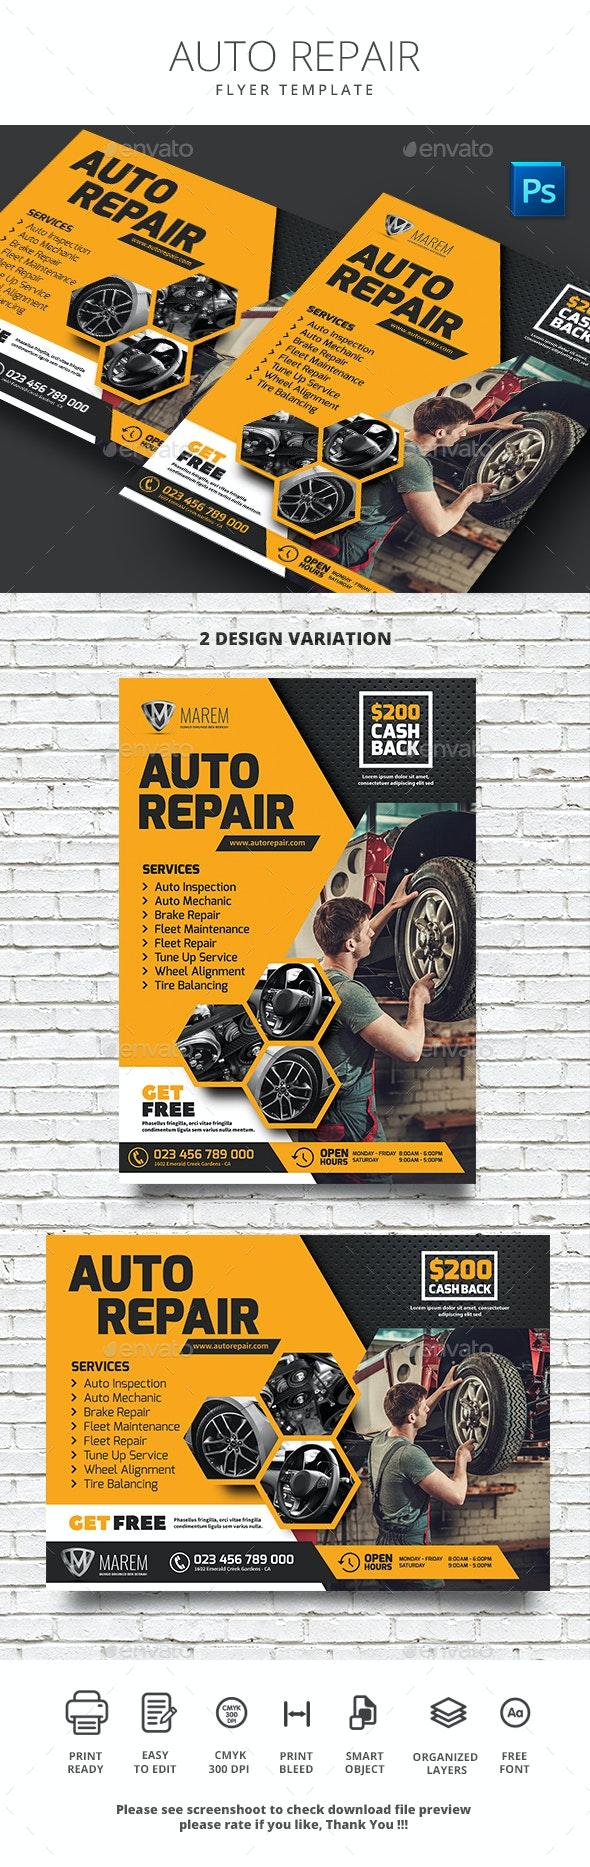 Auto Repair Flyer - Commerce Flyers